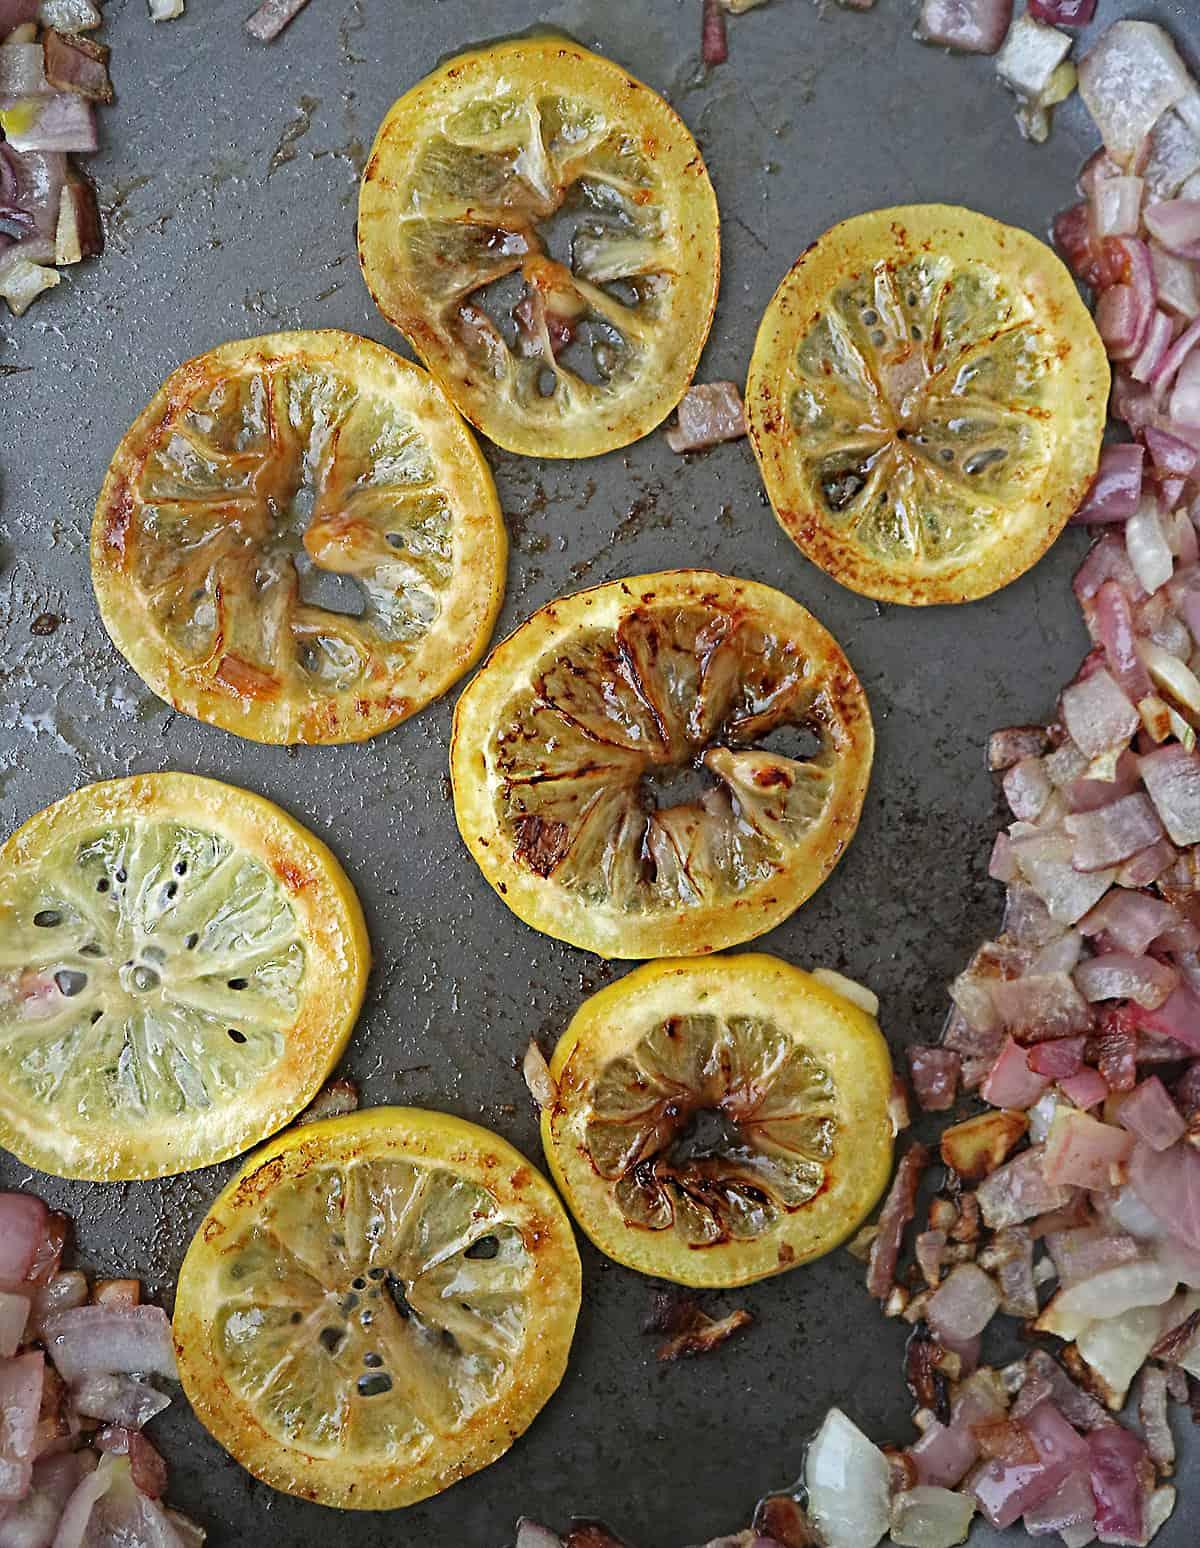 Sauteing lemon until slightly golden